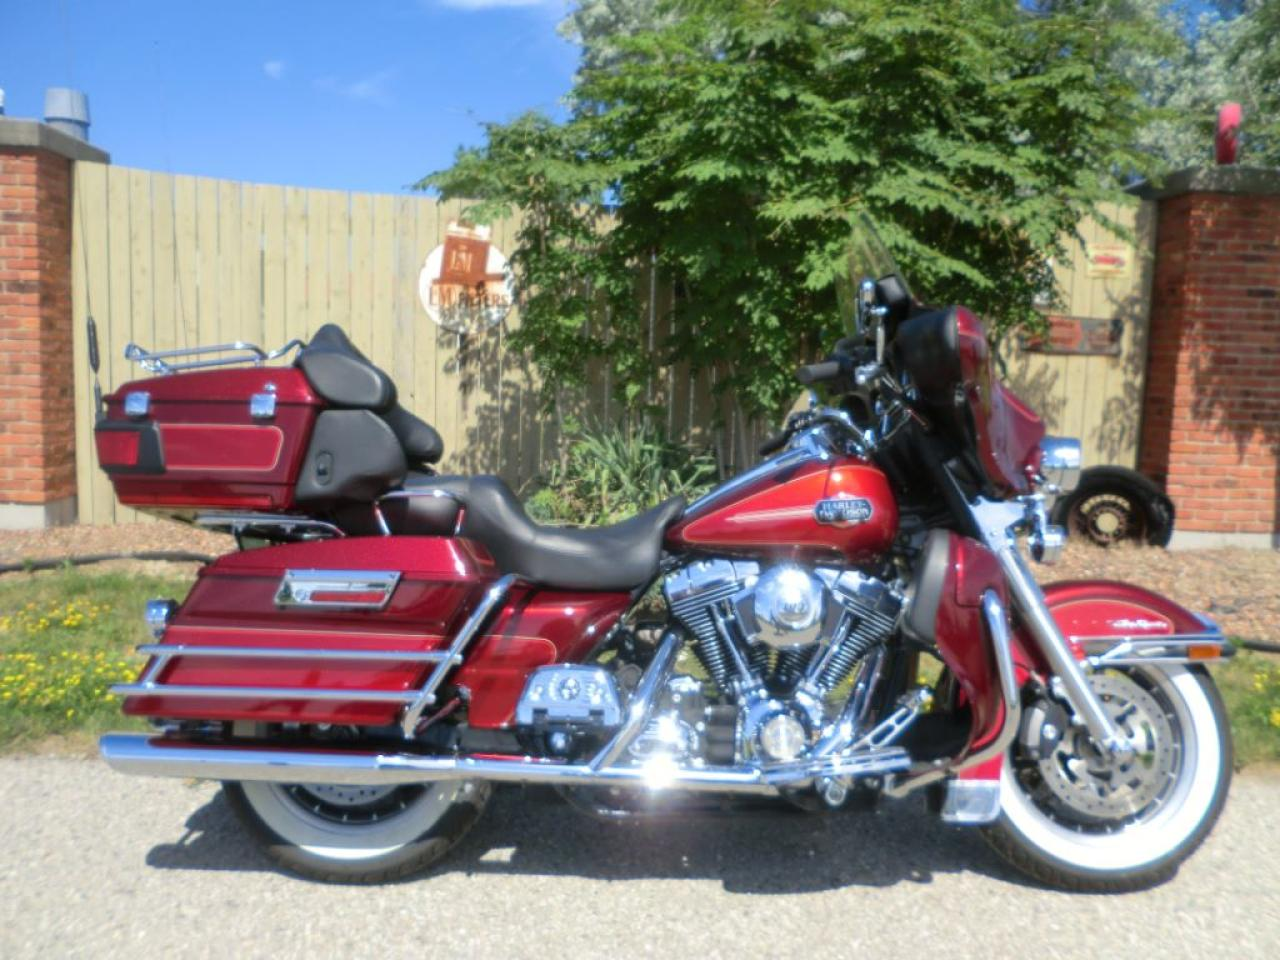 2008 Harley-Davidson Touring FLHTCU ELECTRAGLIDE ULTRA CLASSIC